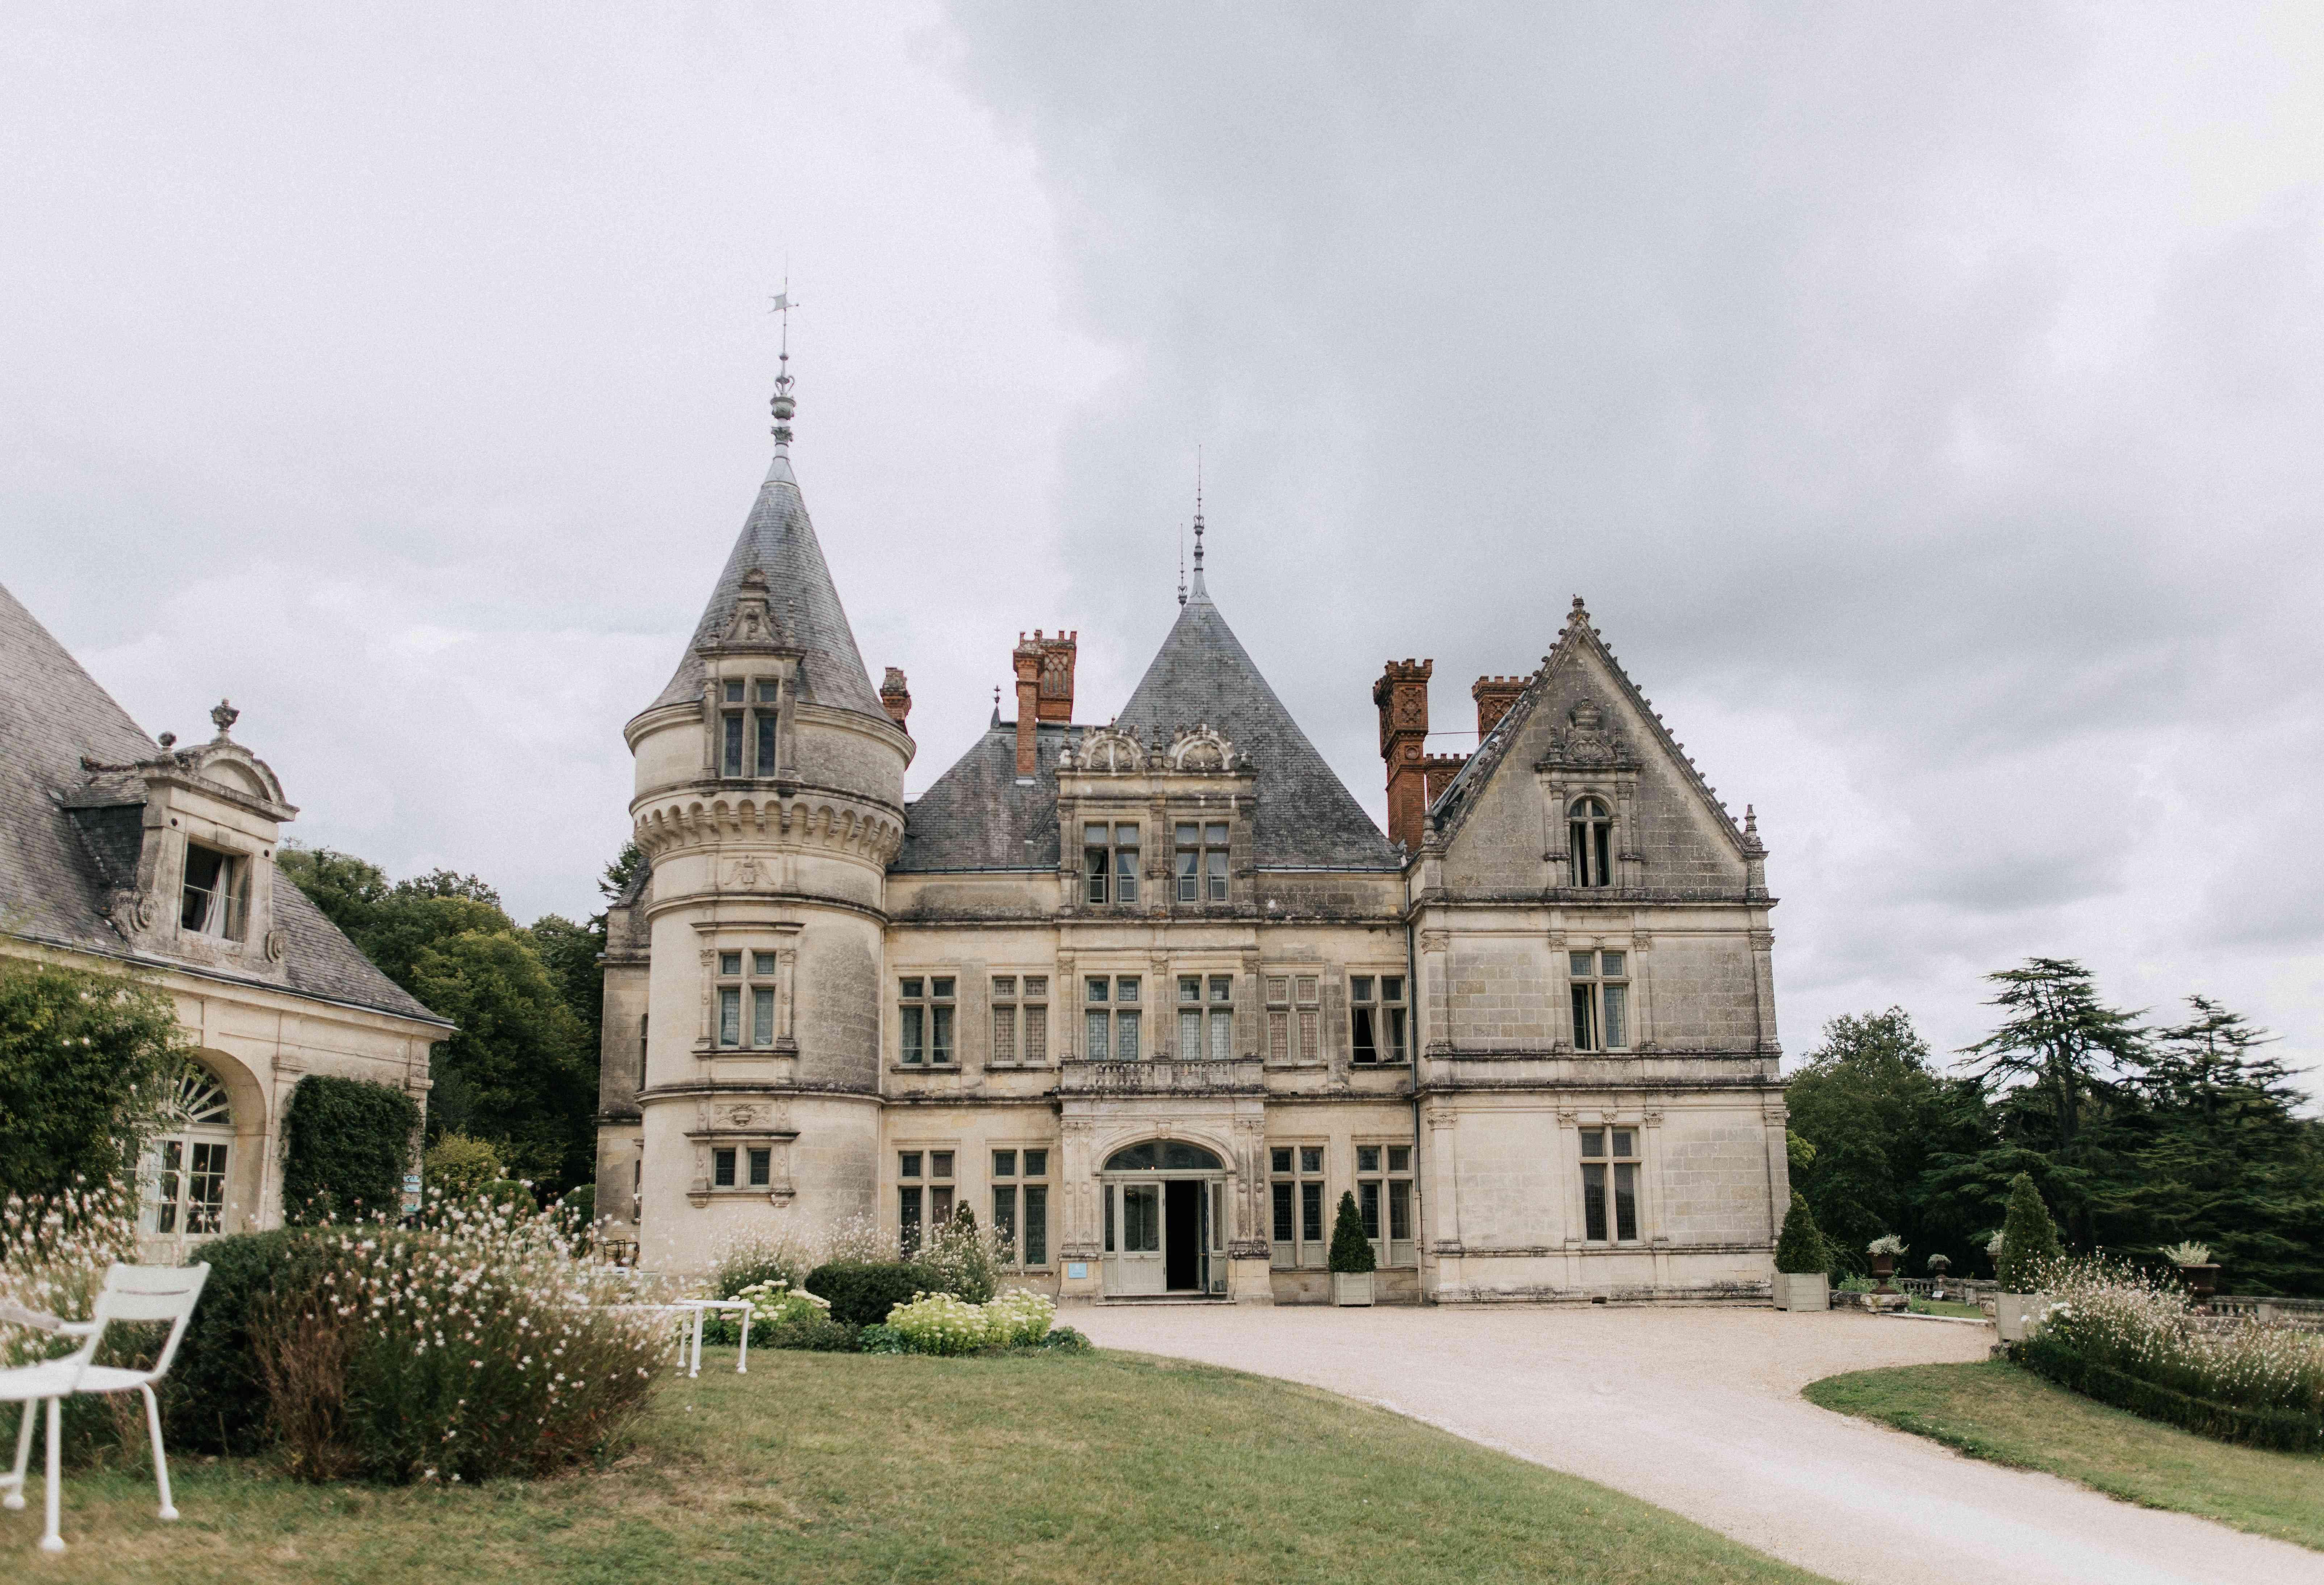 <p>Chateau de la Bourdaisiere</p><br><br>